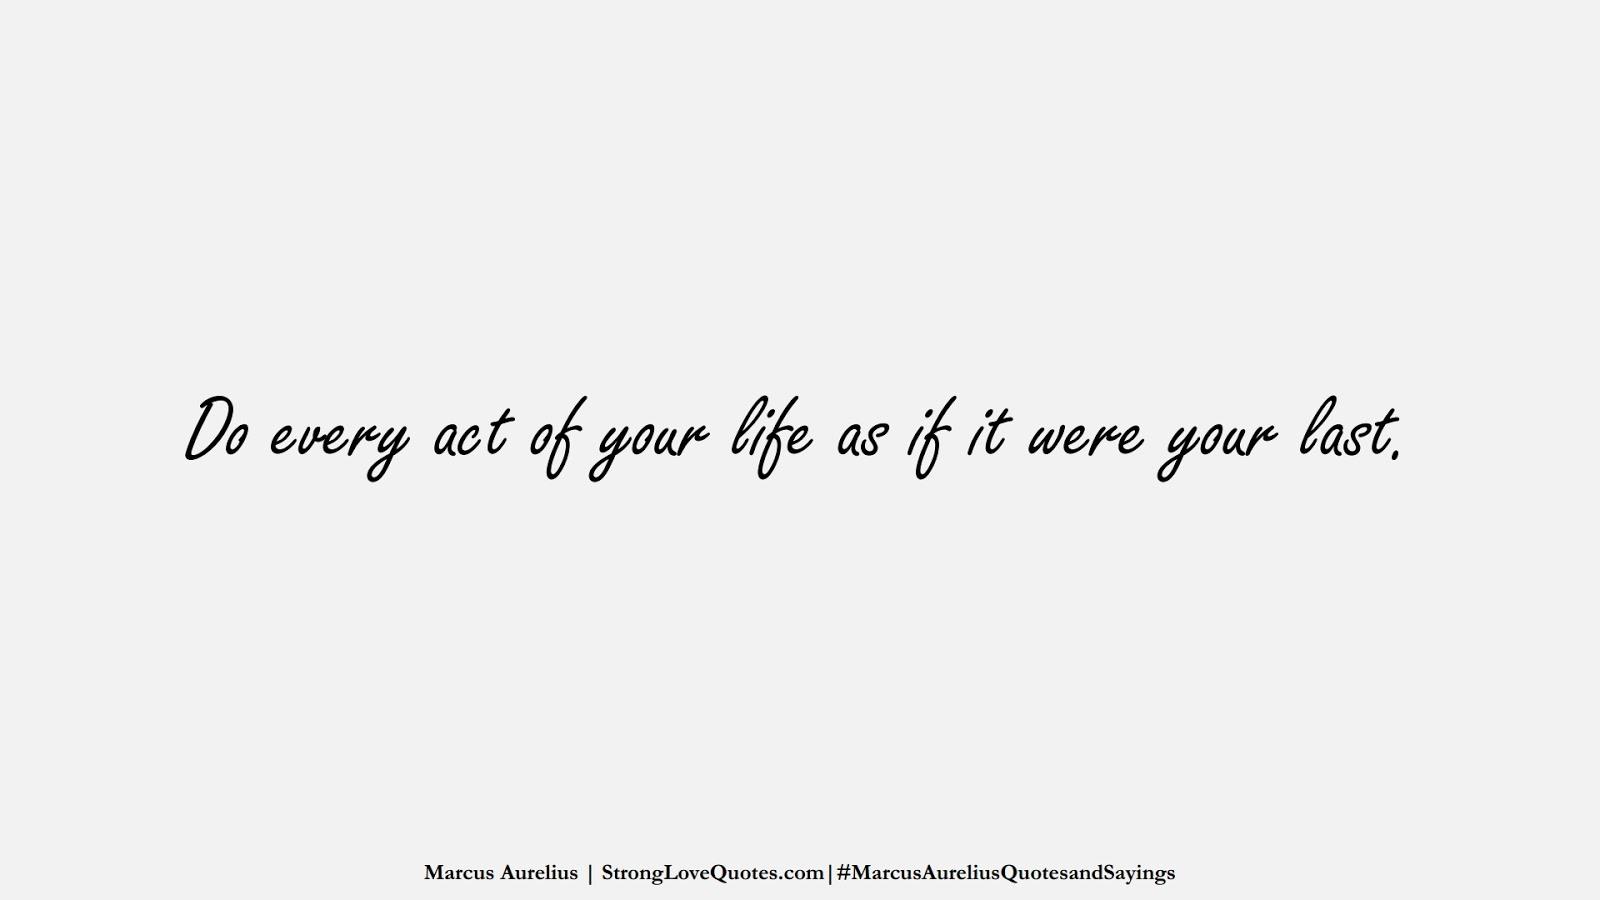 Do every act of your life as if it were your last. (Marcus Aurelius);  #MarcusAureliusQuotesandSayings